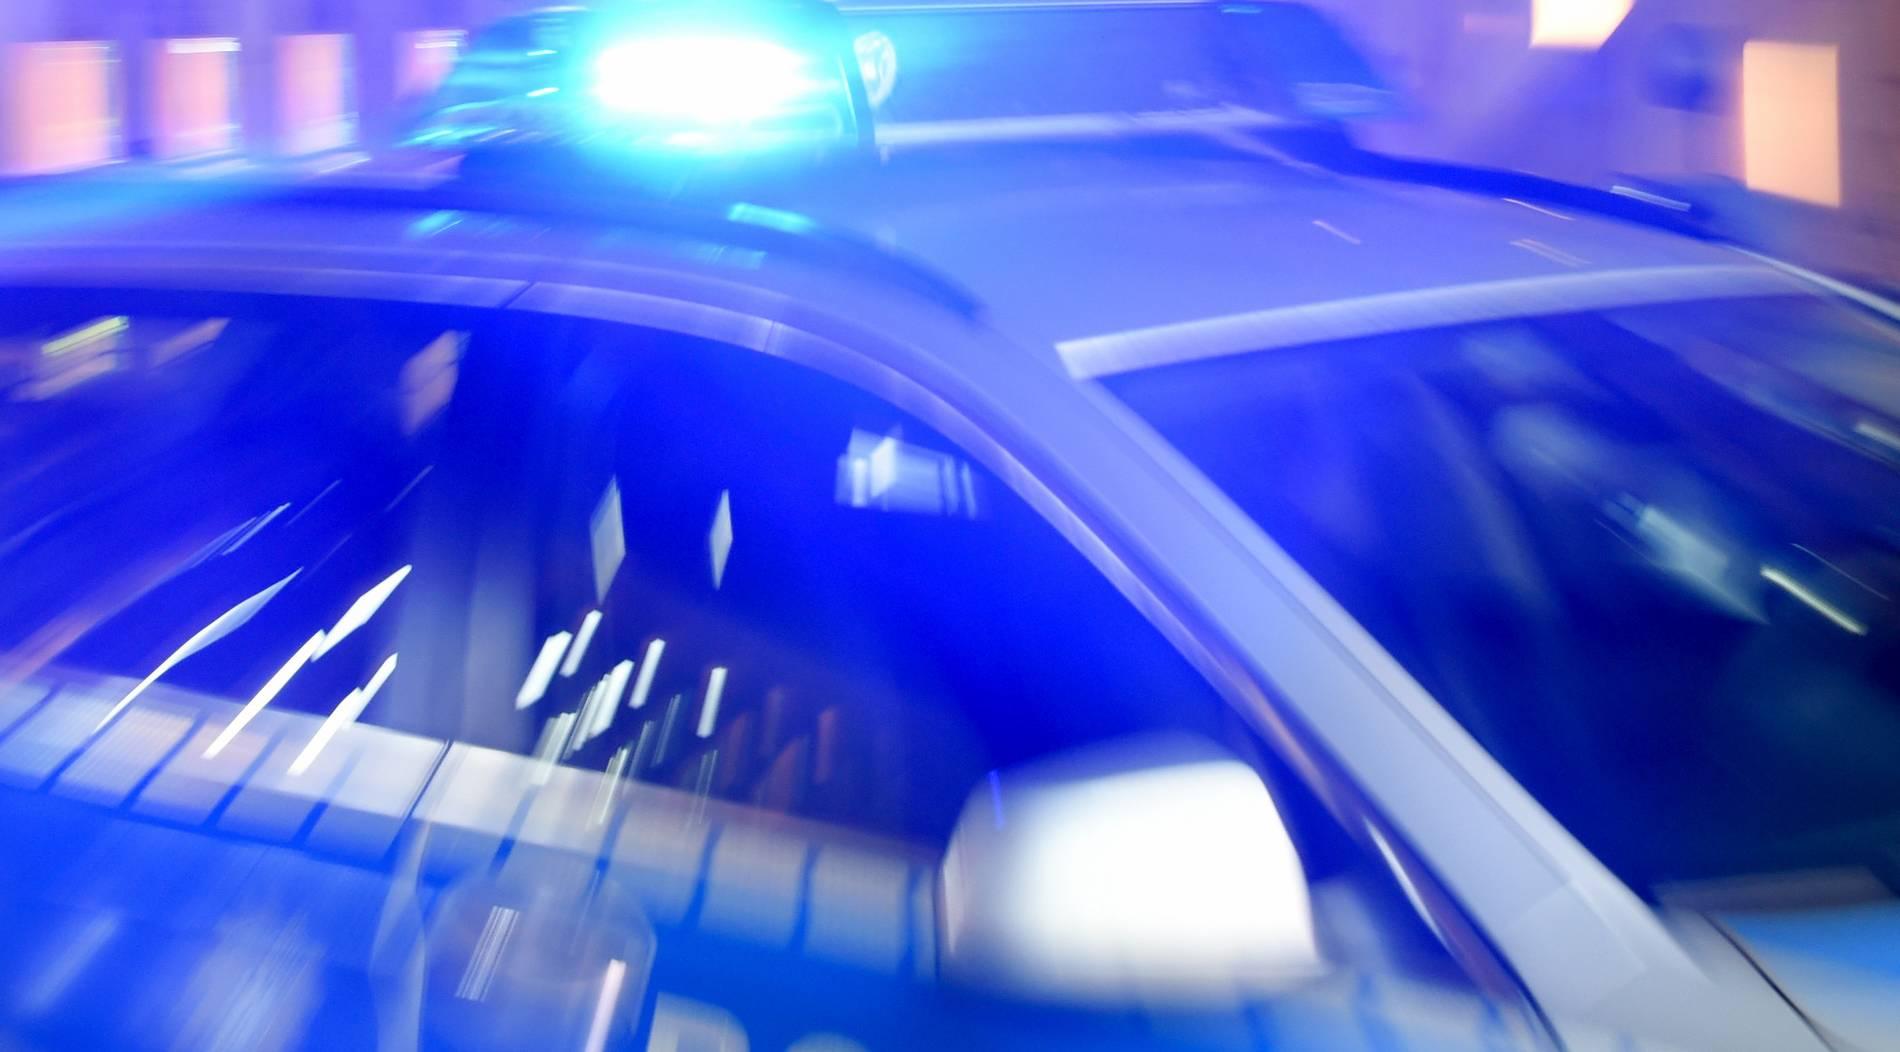 Kran-Unfall im April kostete Covestro Millionen